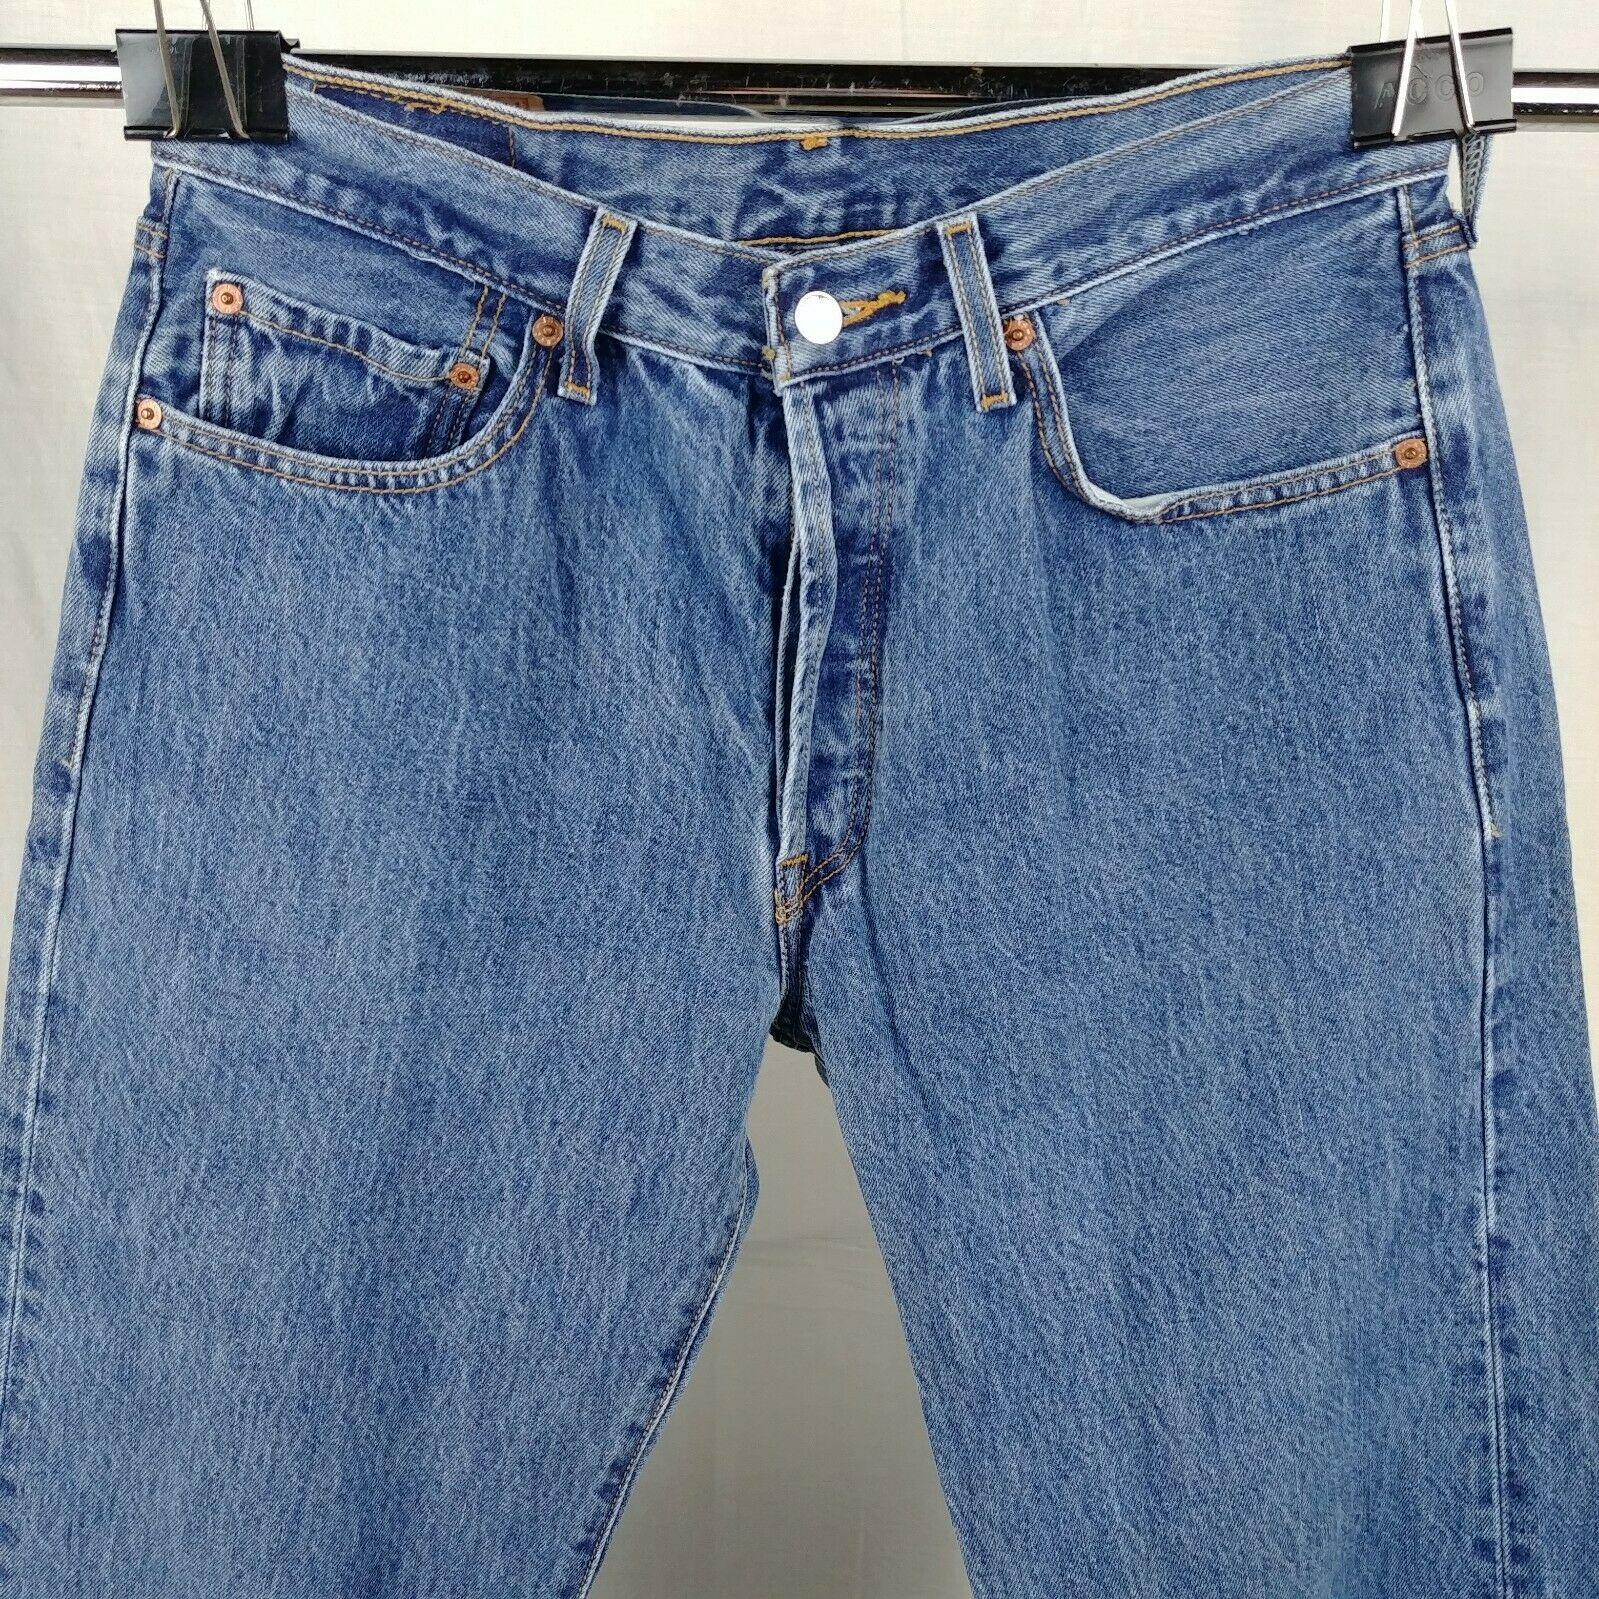 8b3232fe079b07 Levi 501 Button Fly Blue Jeans Mens Size 34 x 30 100% Cotton ...